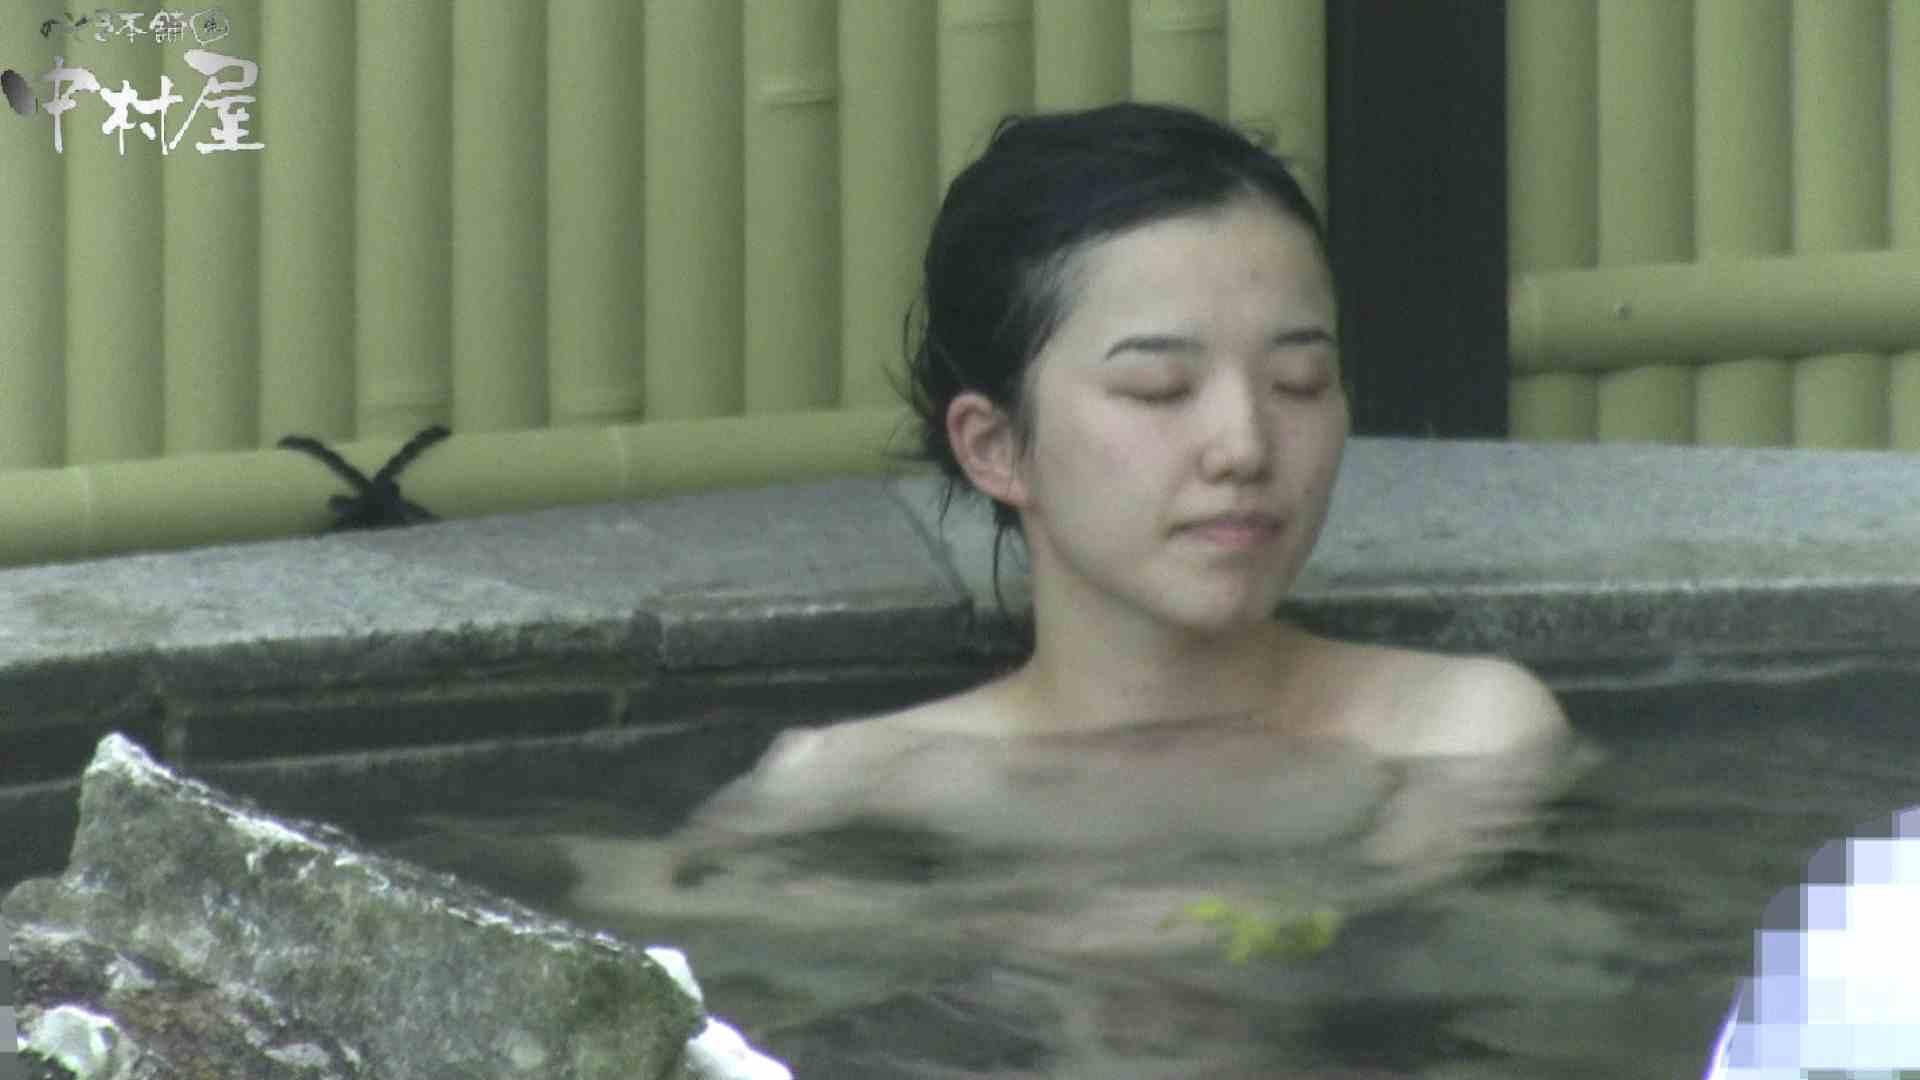 Aquaな露天風呂Vol.908 0  39連発 16